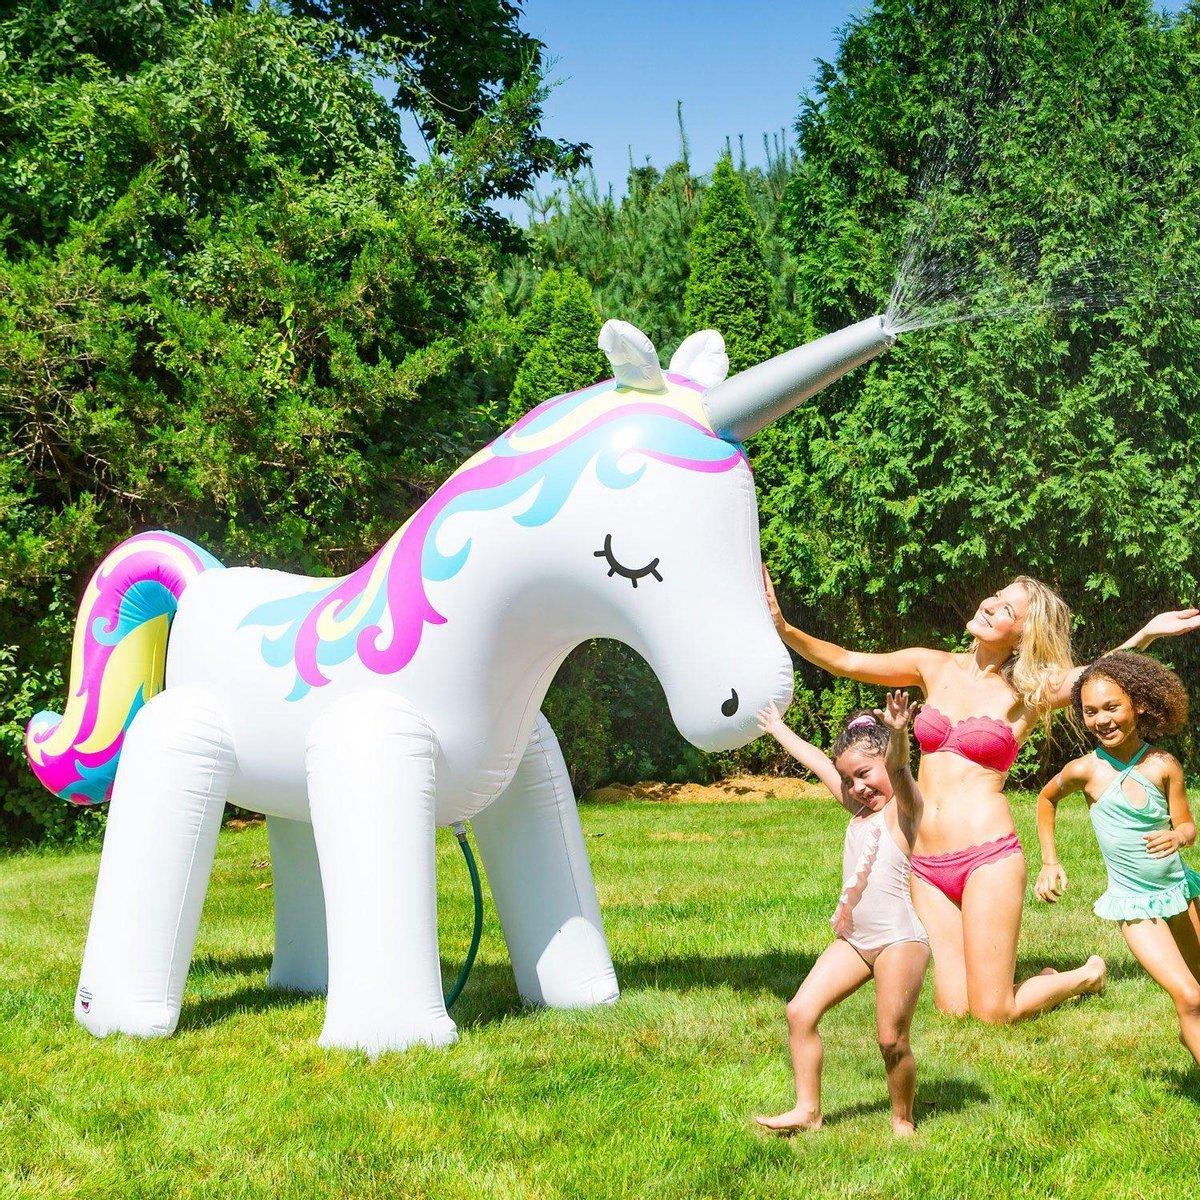 Ginormous Unicorn Sprinkler - Opblaasbare Eenhoorn met Fontein - waterspeelgoed